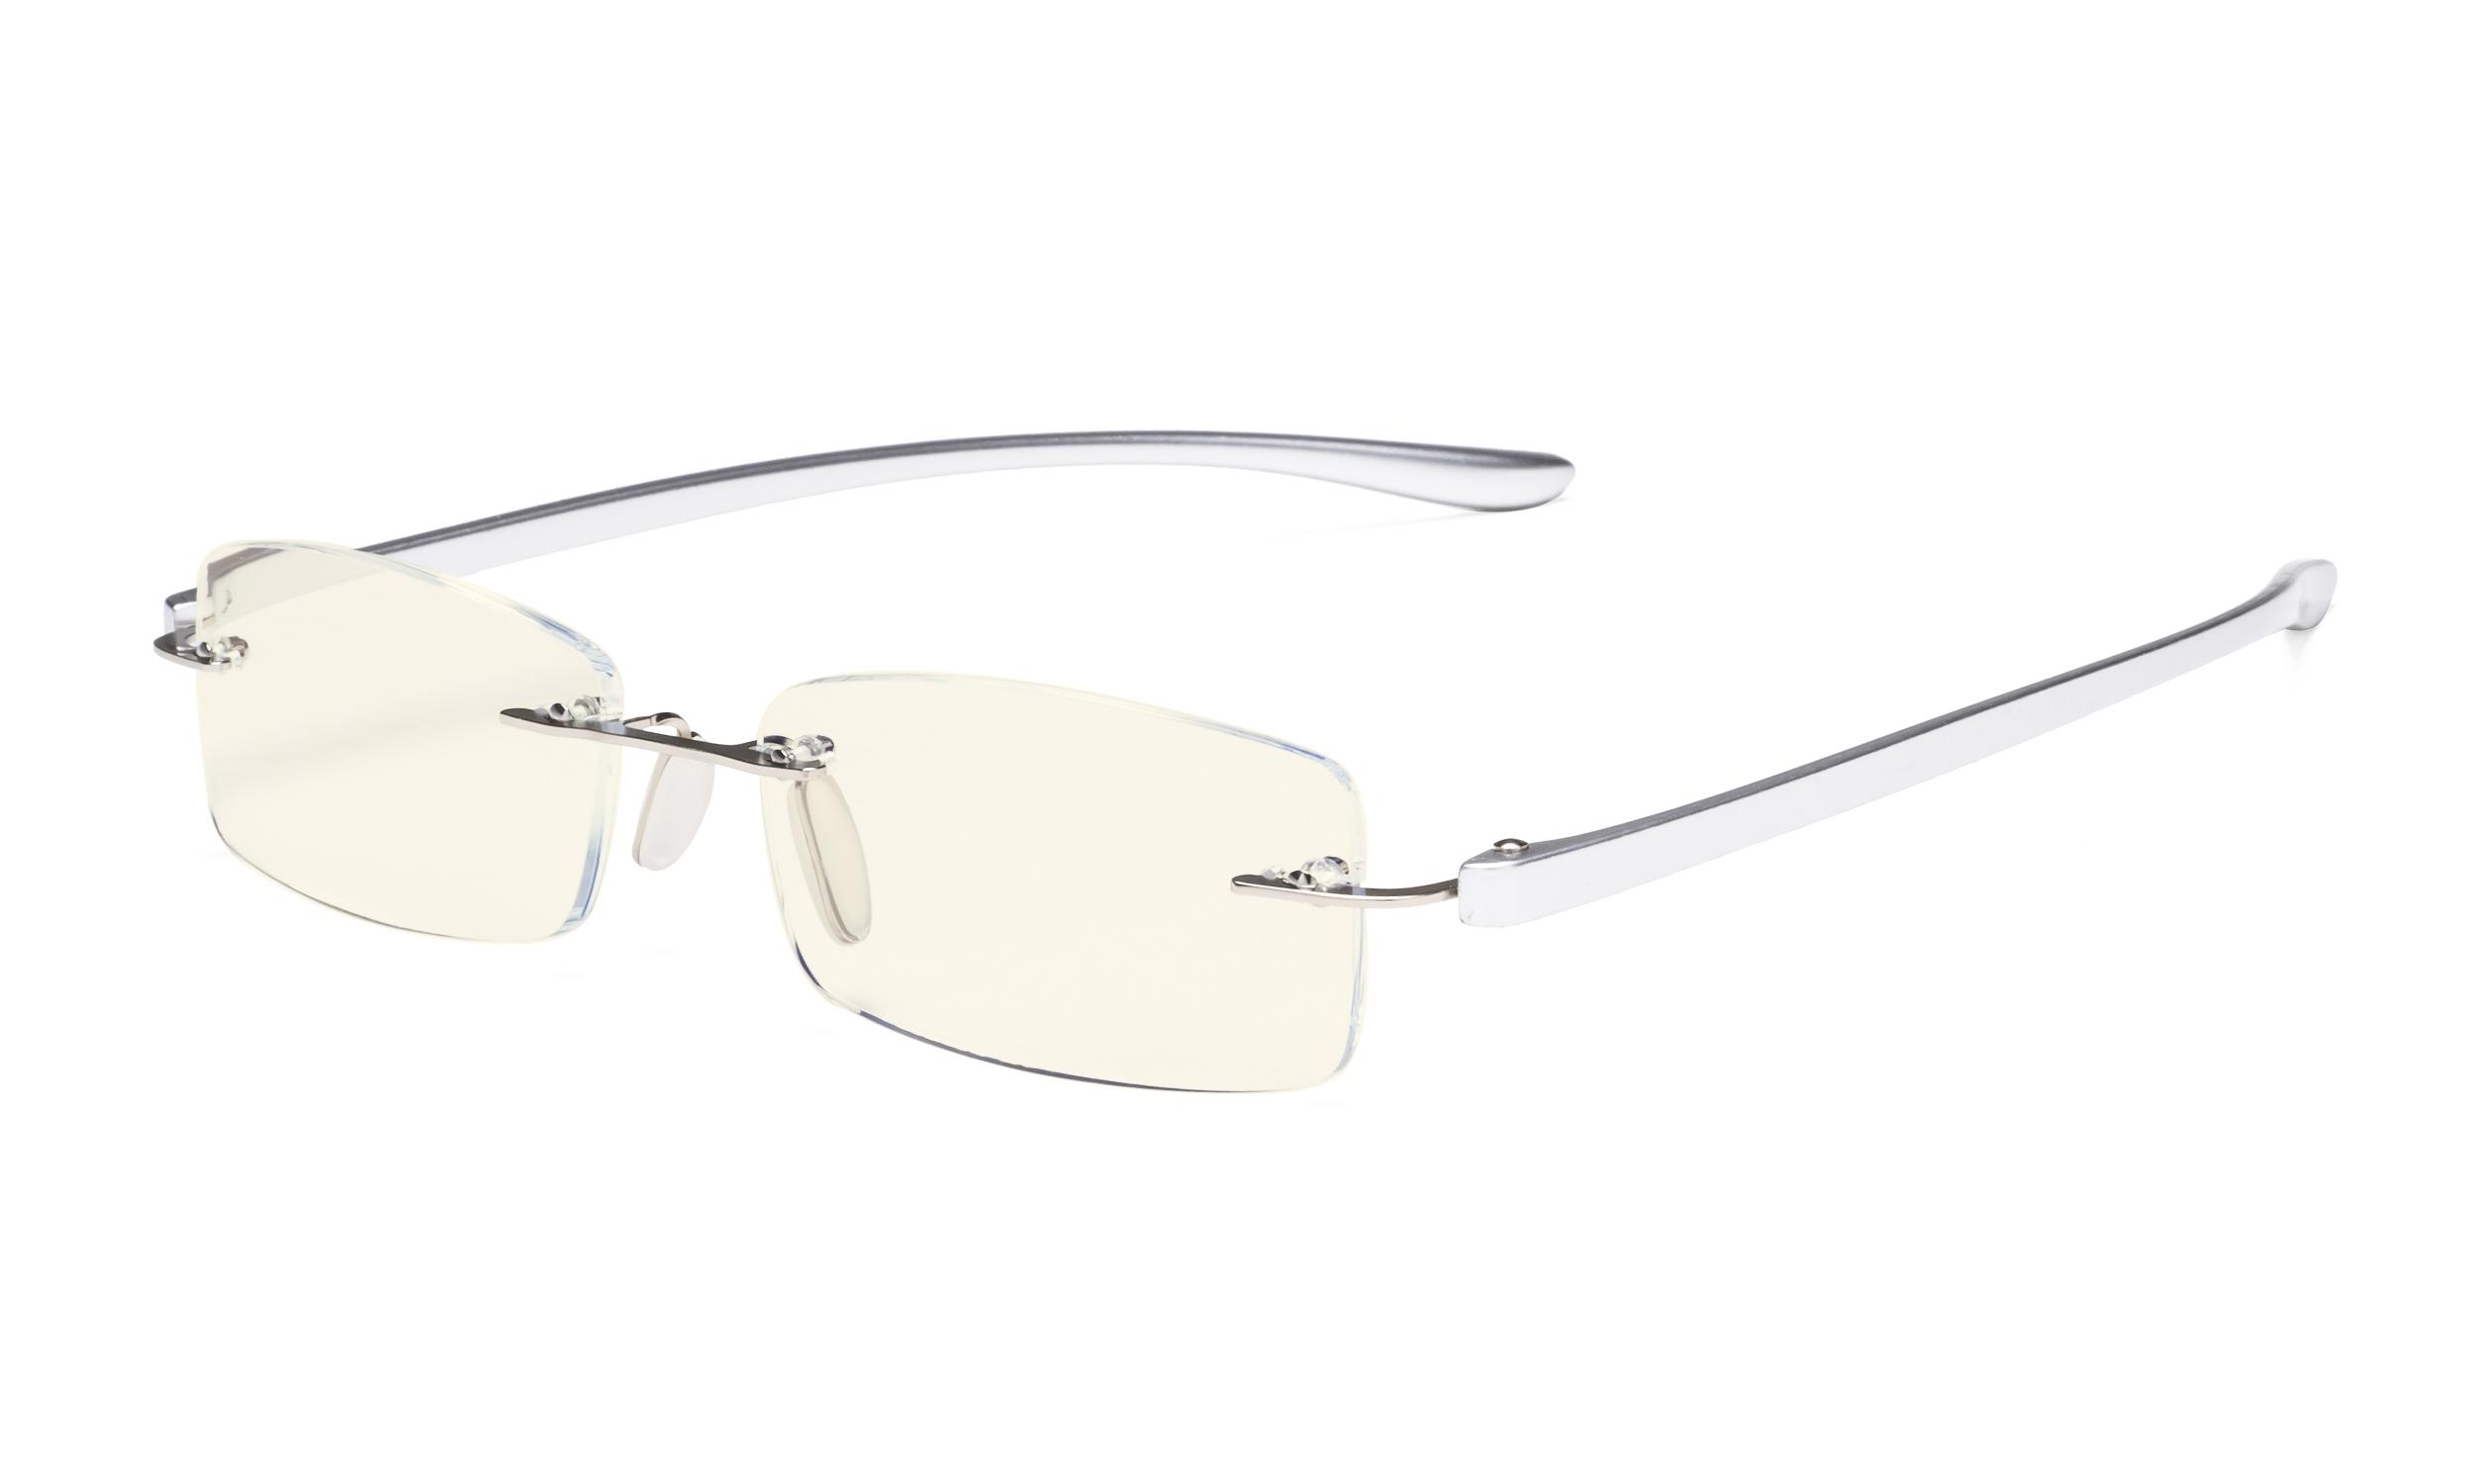 2fe01aec5447 Eyekepper Computer Reading Glasses Blue Light Filter Rimless Readers UV  Protection Silver UVCG1